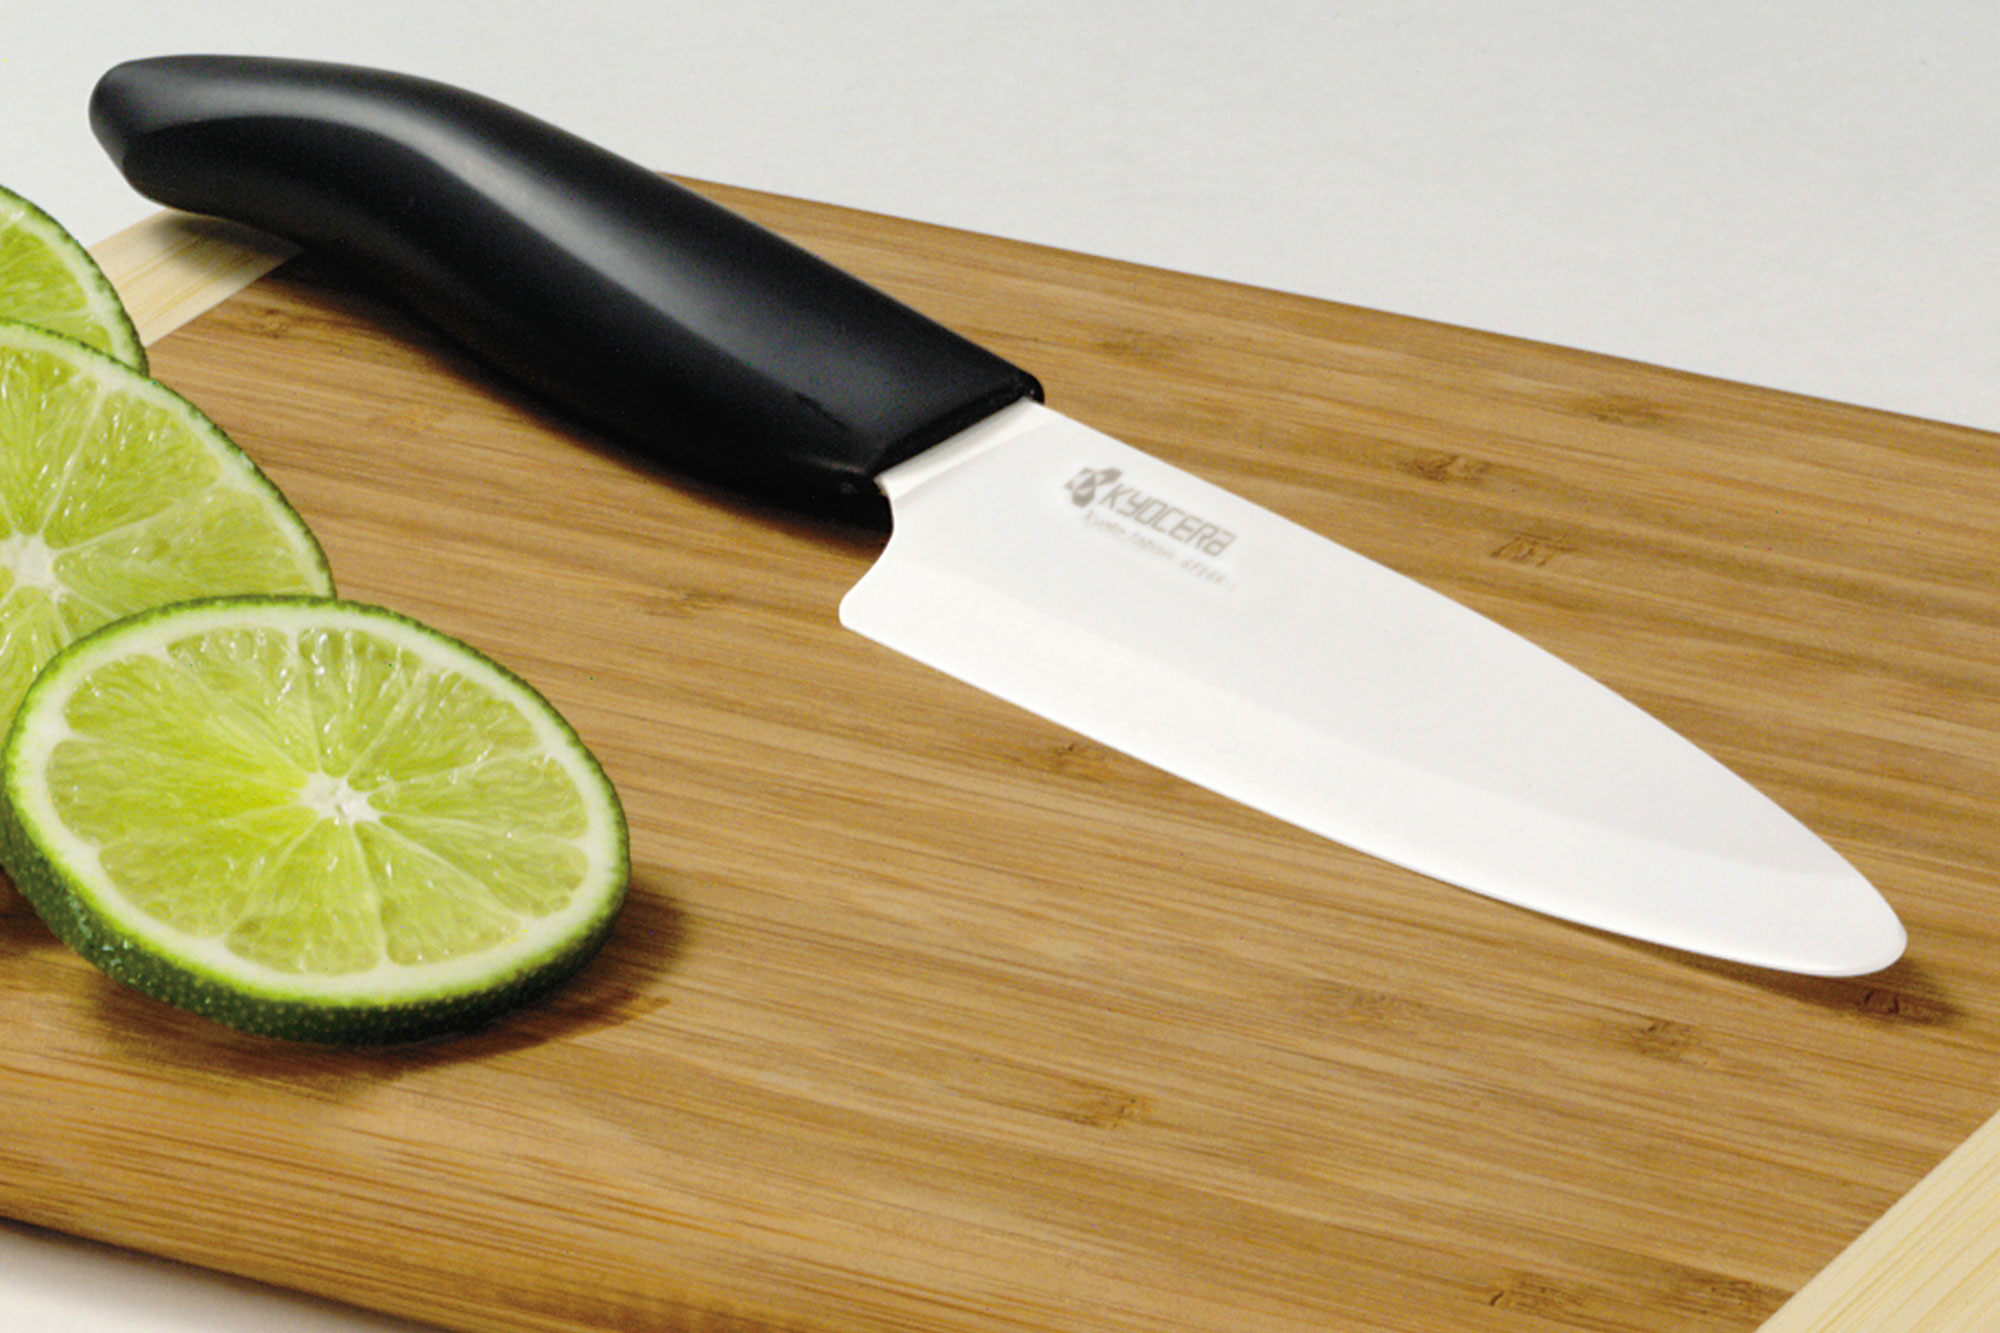 Kyocera Revolution Ceramic Knife Peeler Amp Slicer Set 3